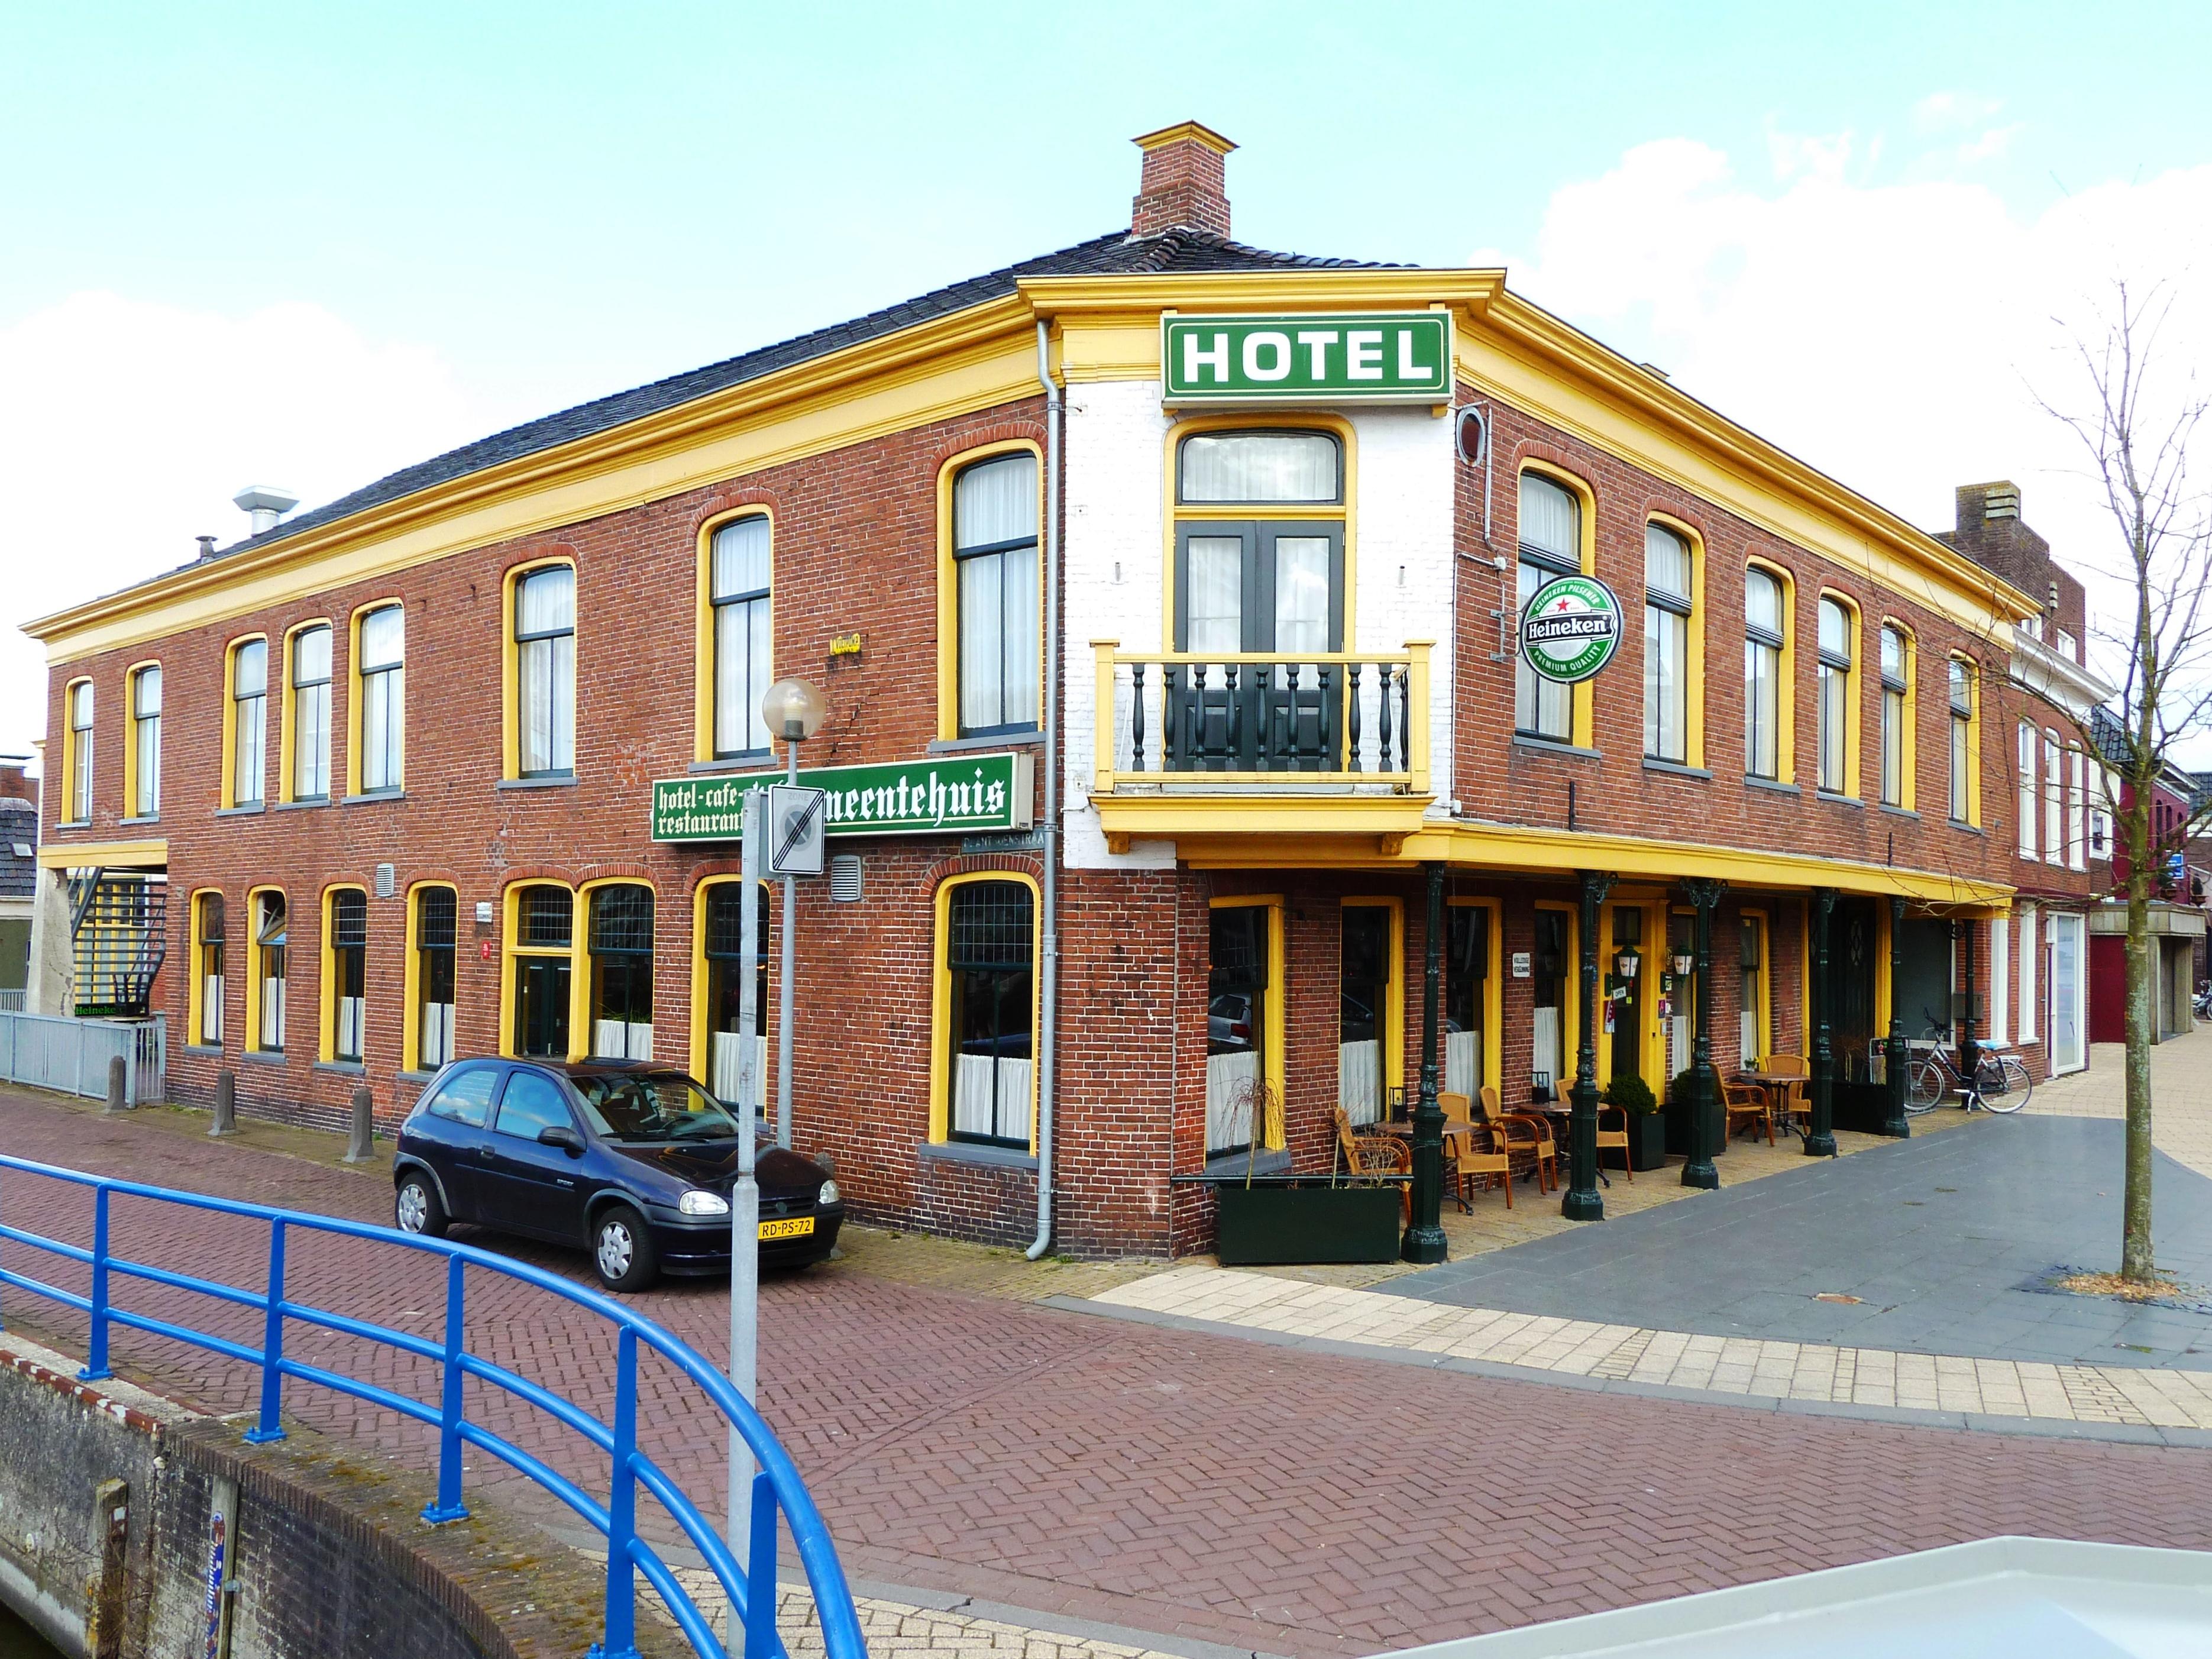 Hotel Restaurant Cafe Gockerlwirt Alt Ef Bf Bdtting